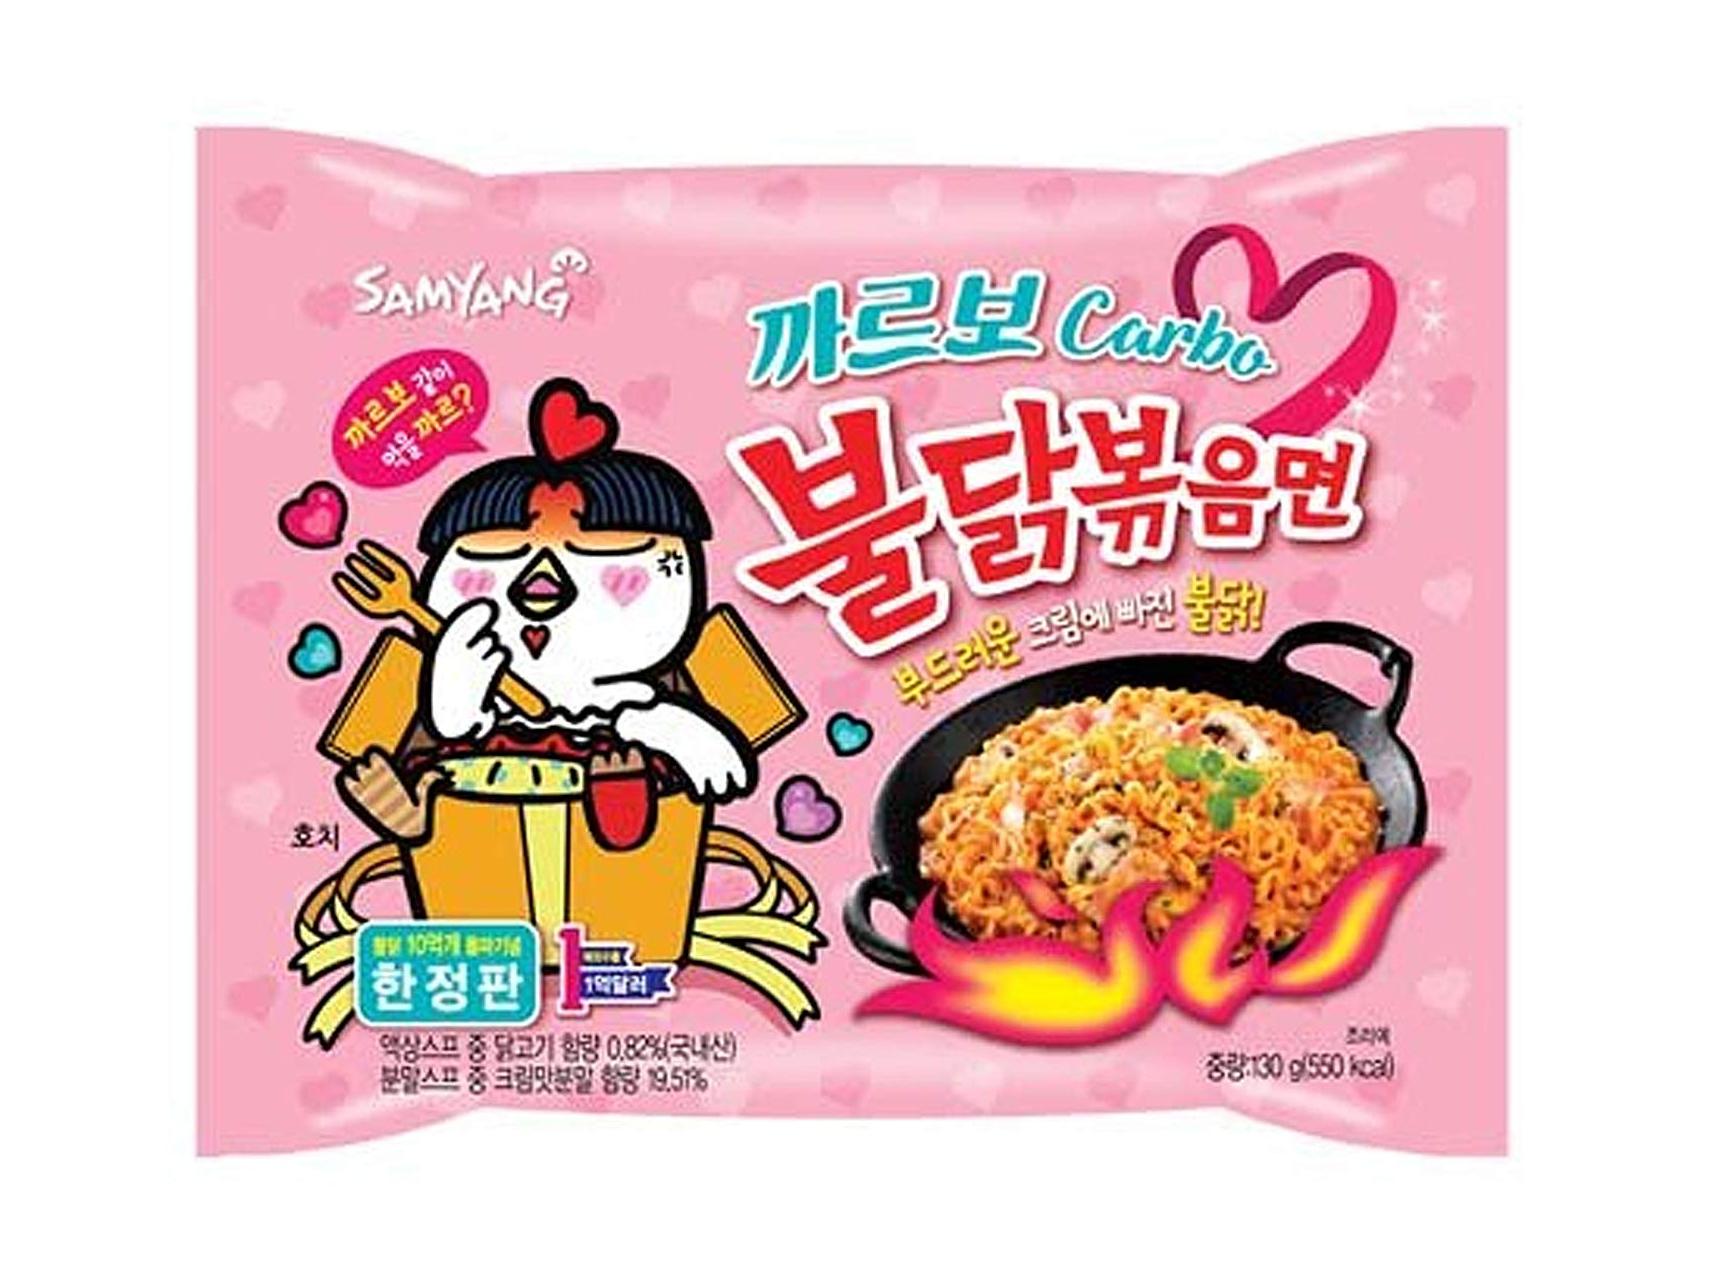 Hot chicken carbo flavor ramen